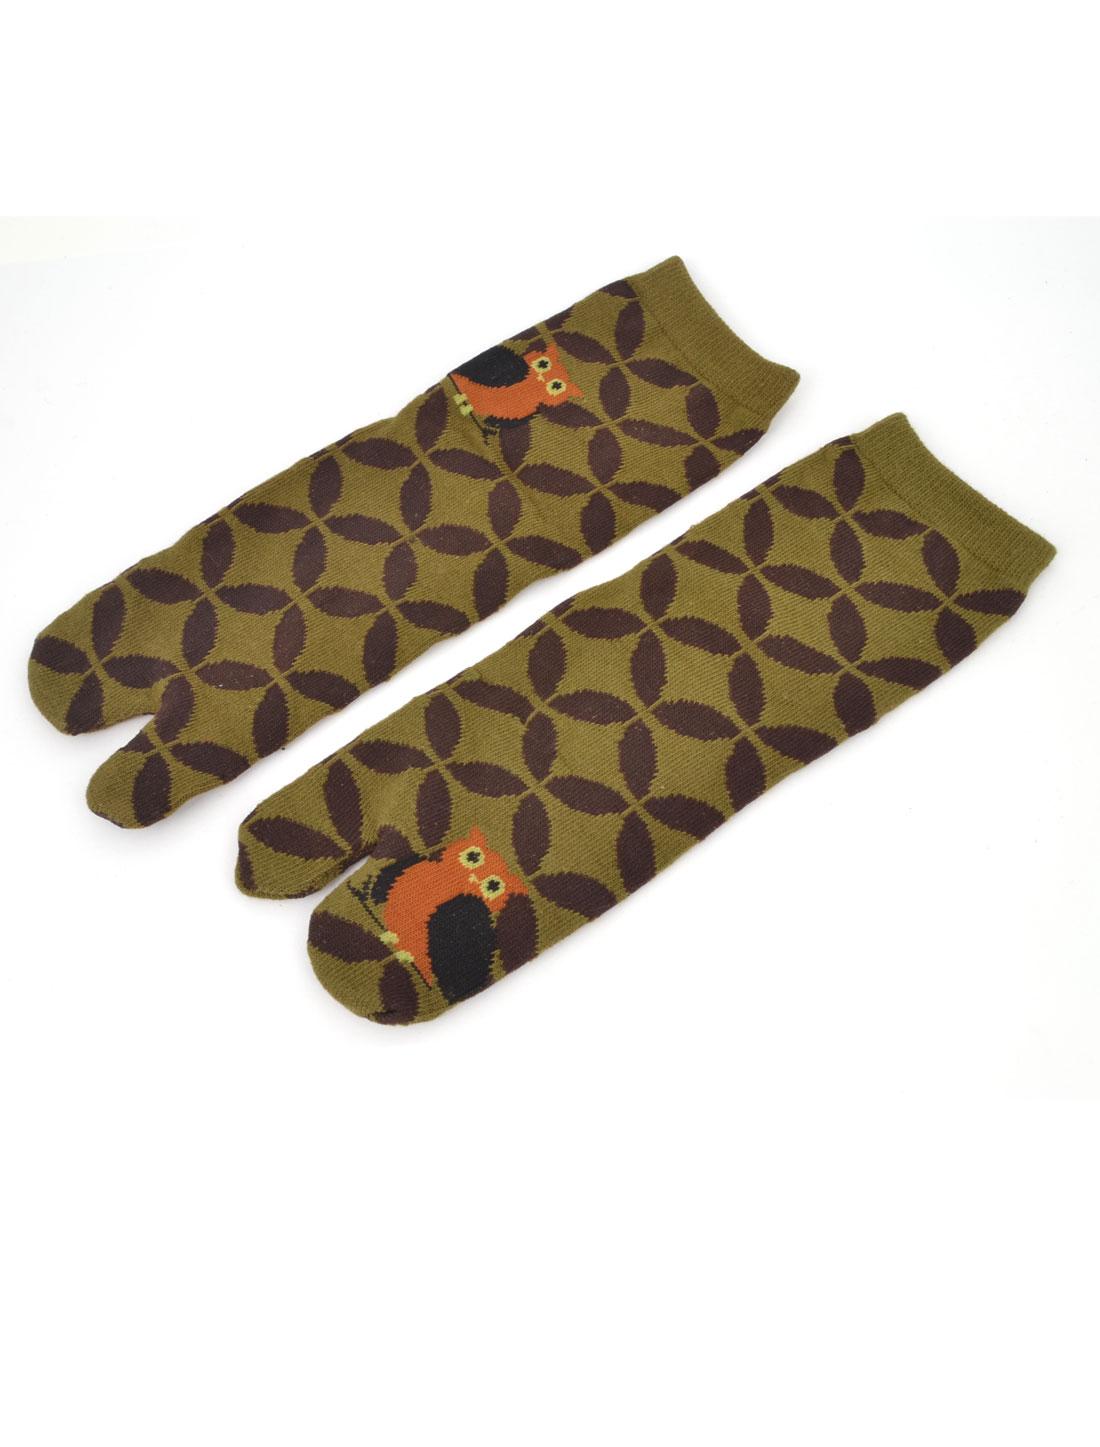 Pair Flower Pattern Sportive Two Toe Socks Brown Dark Khaki